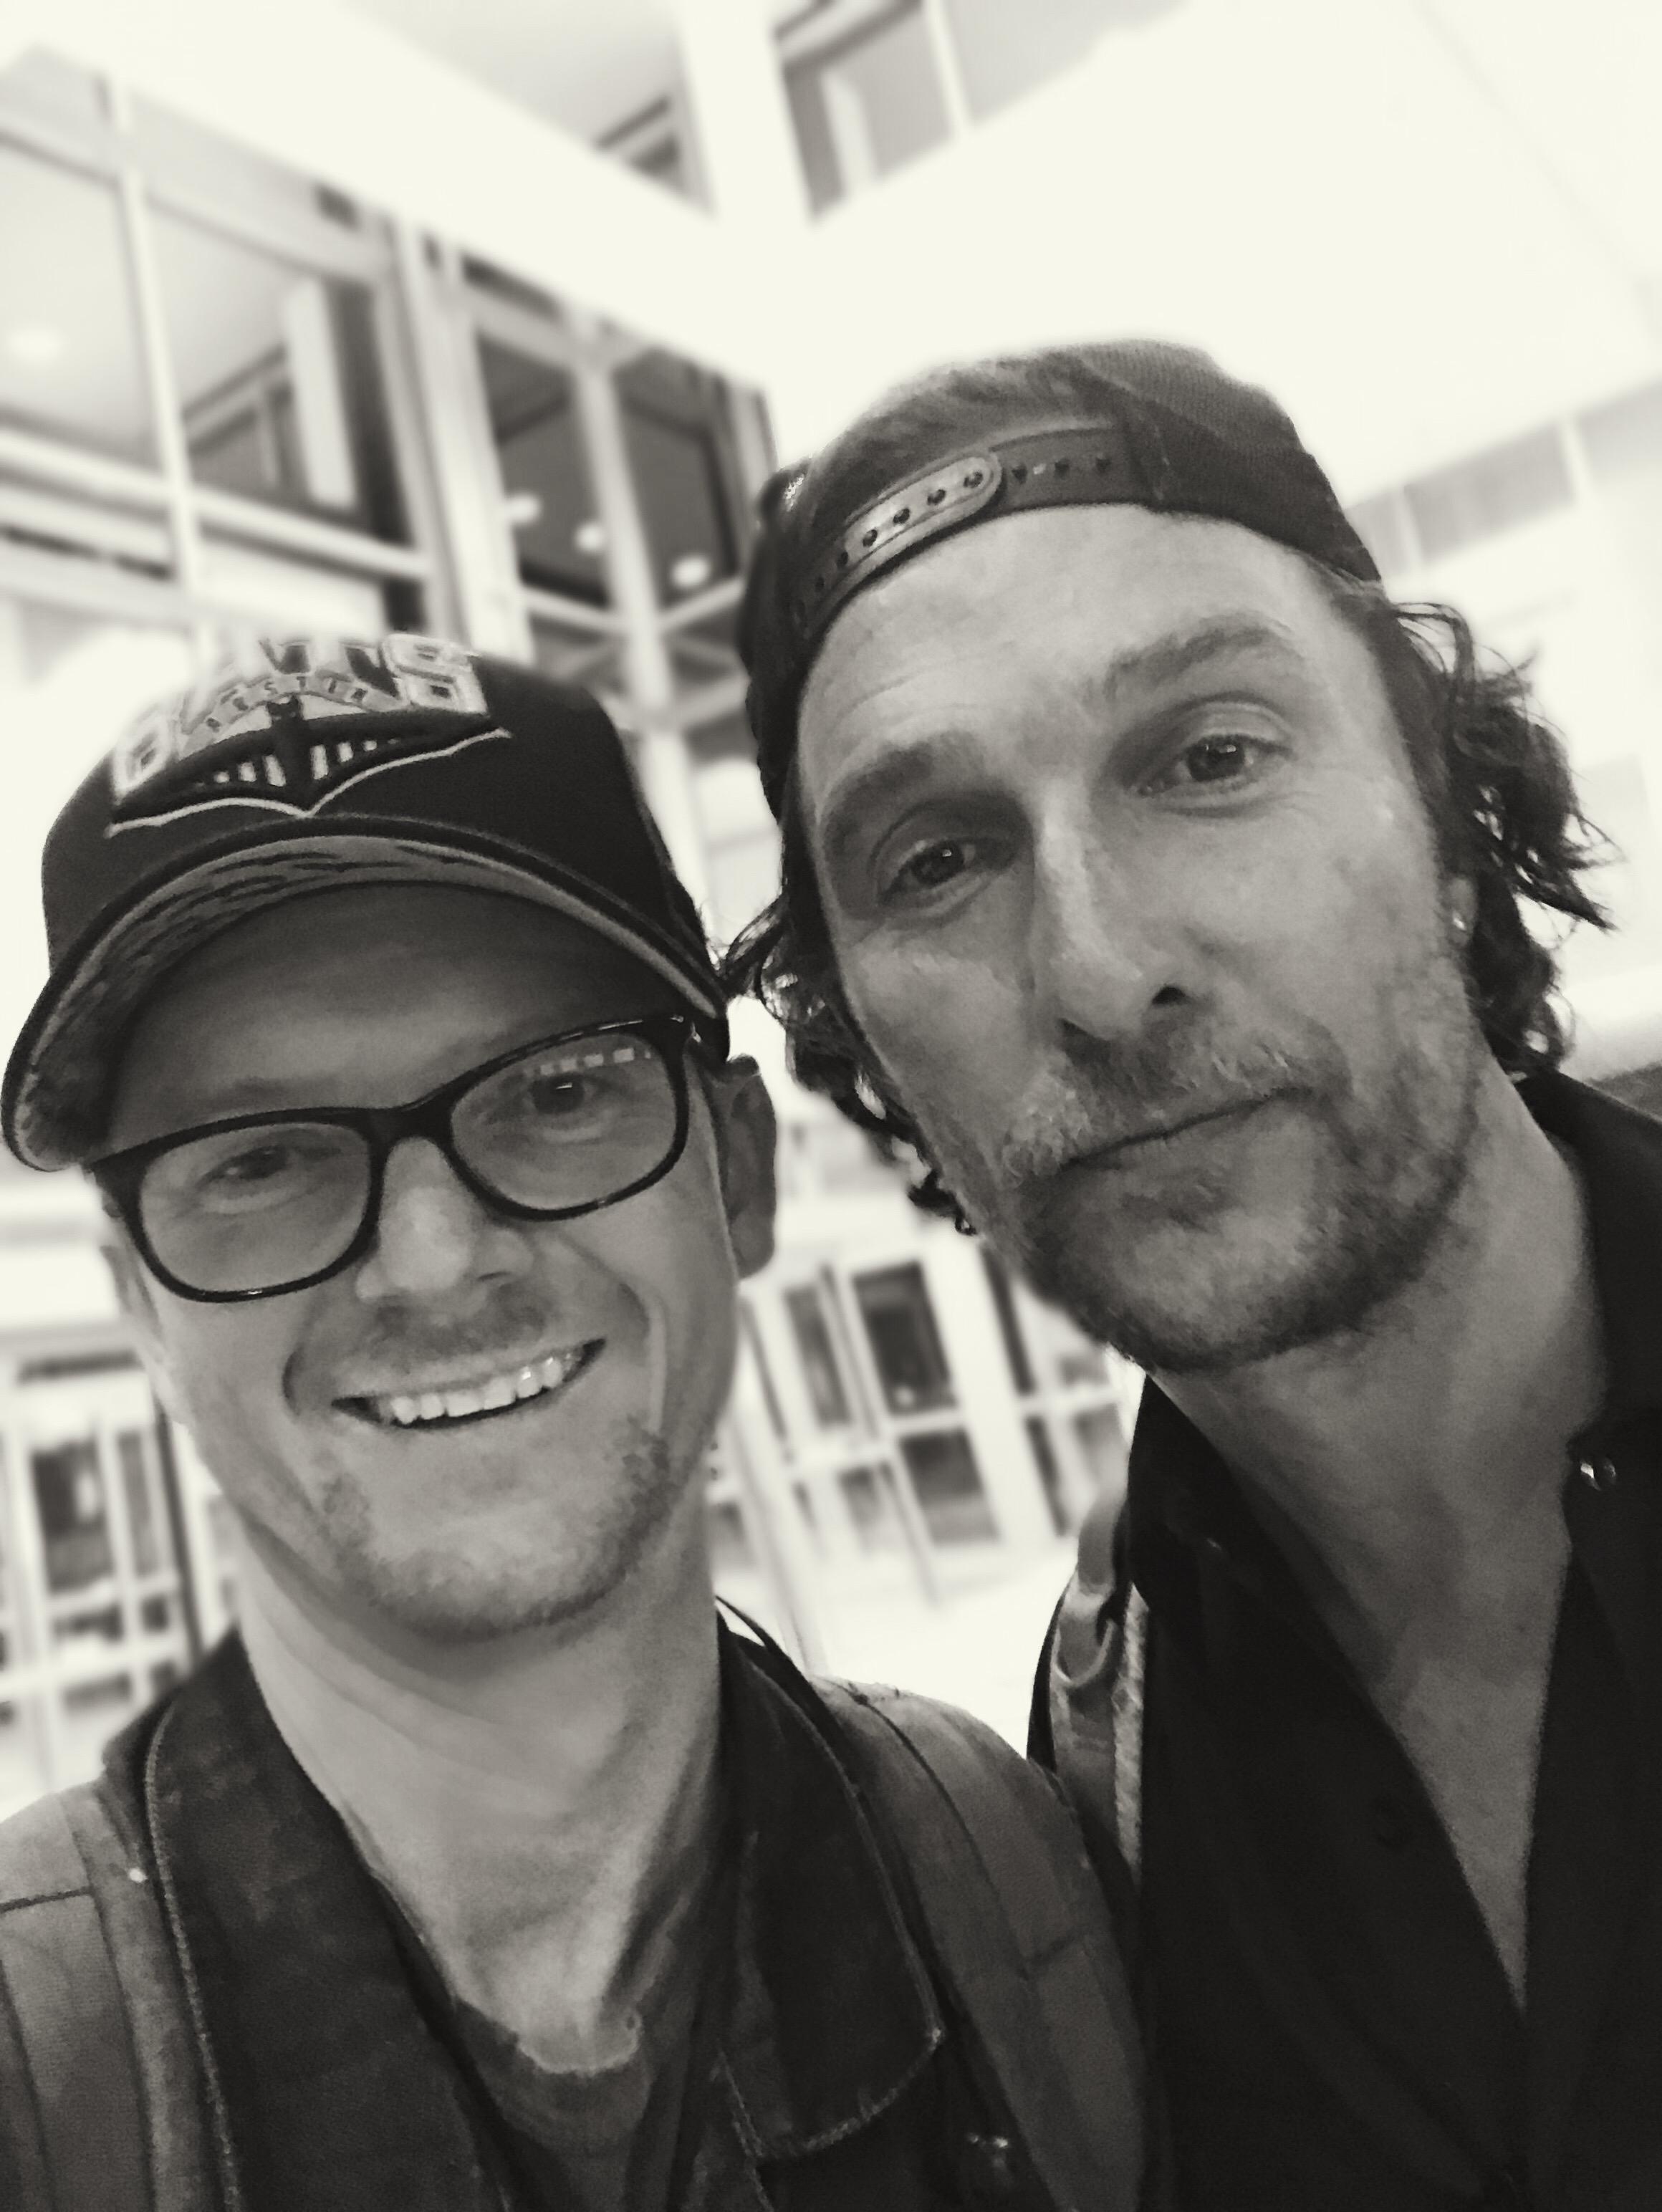 Kyle Bunch with Matthew McConaughey